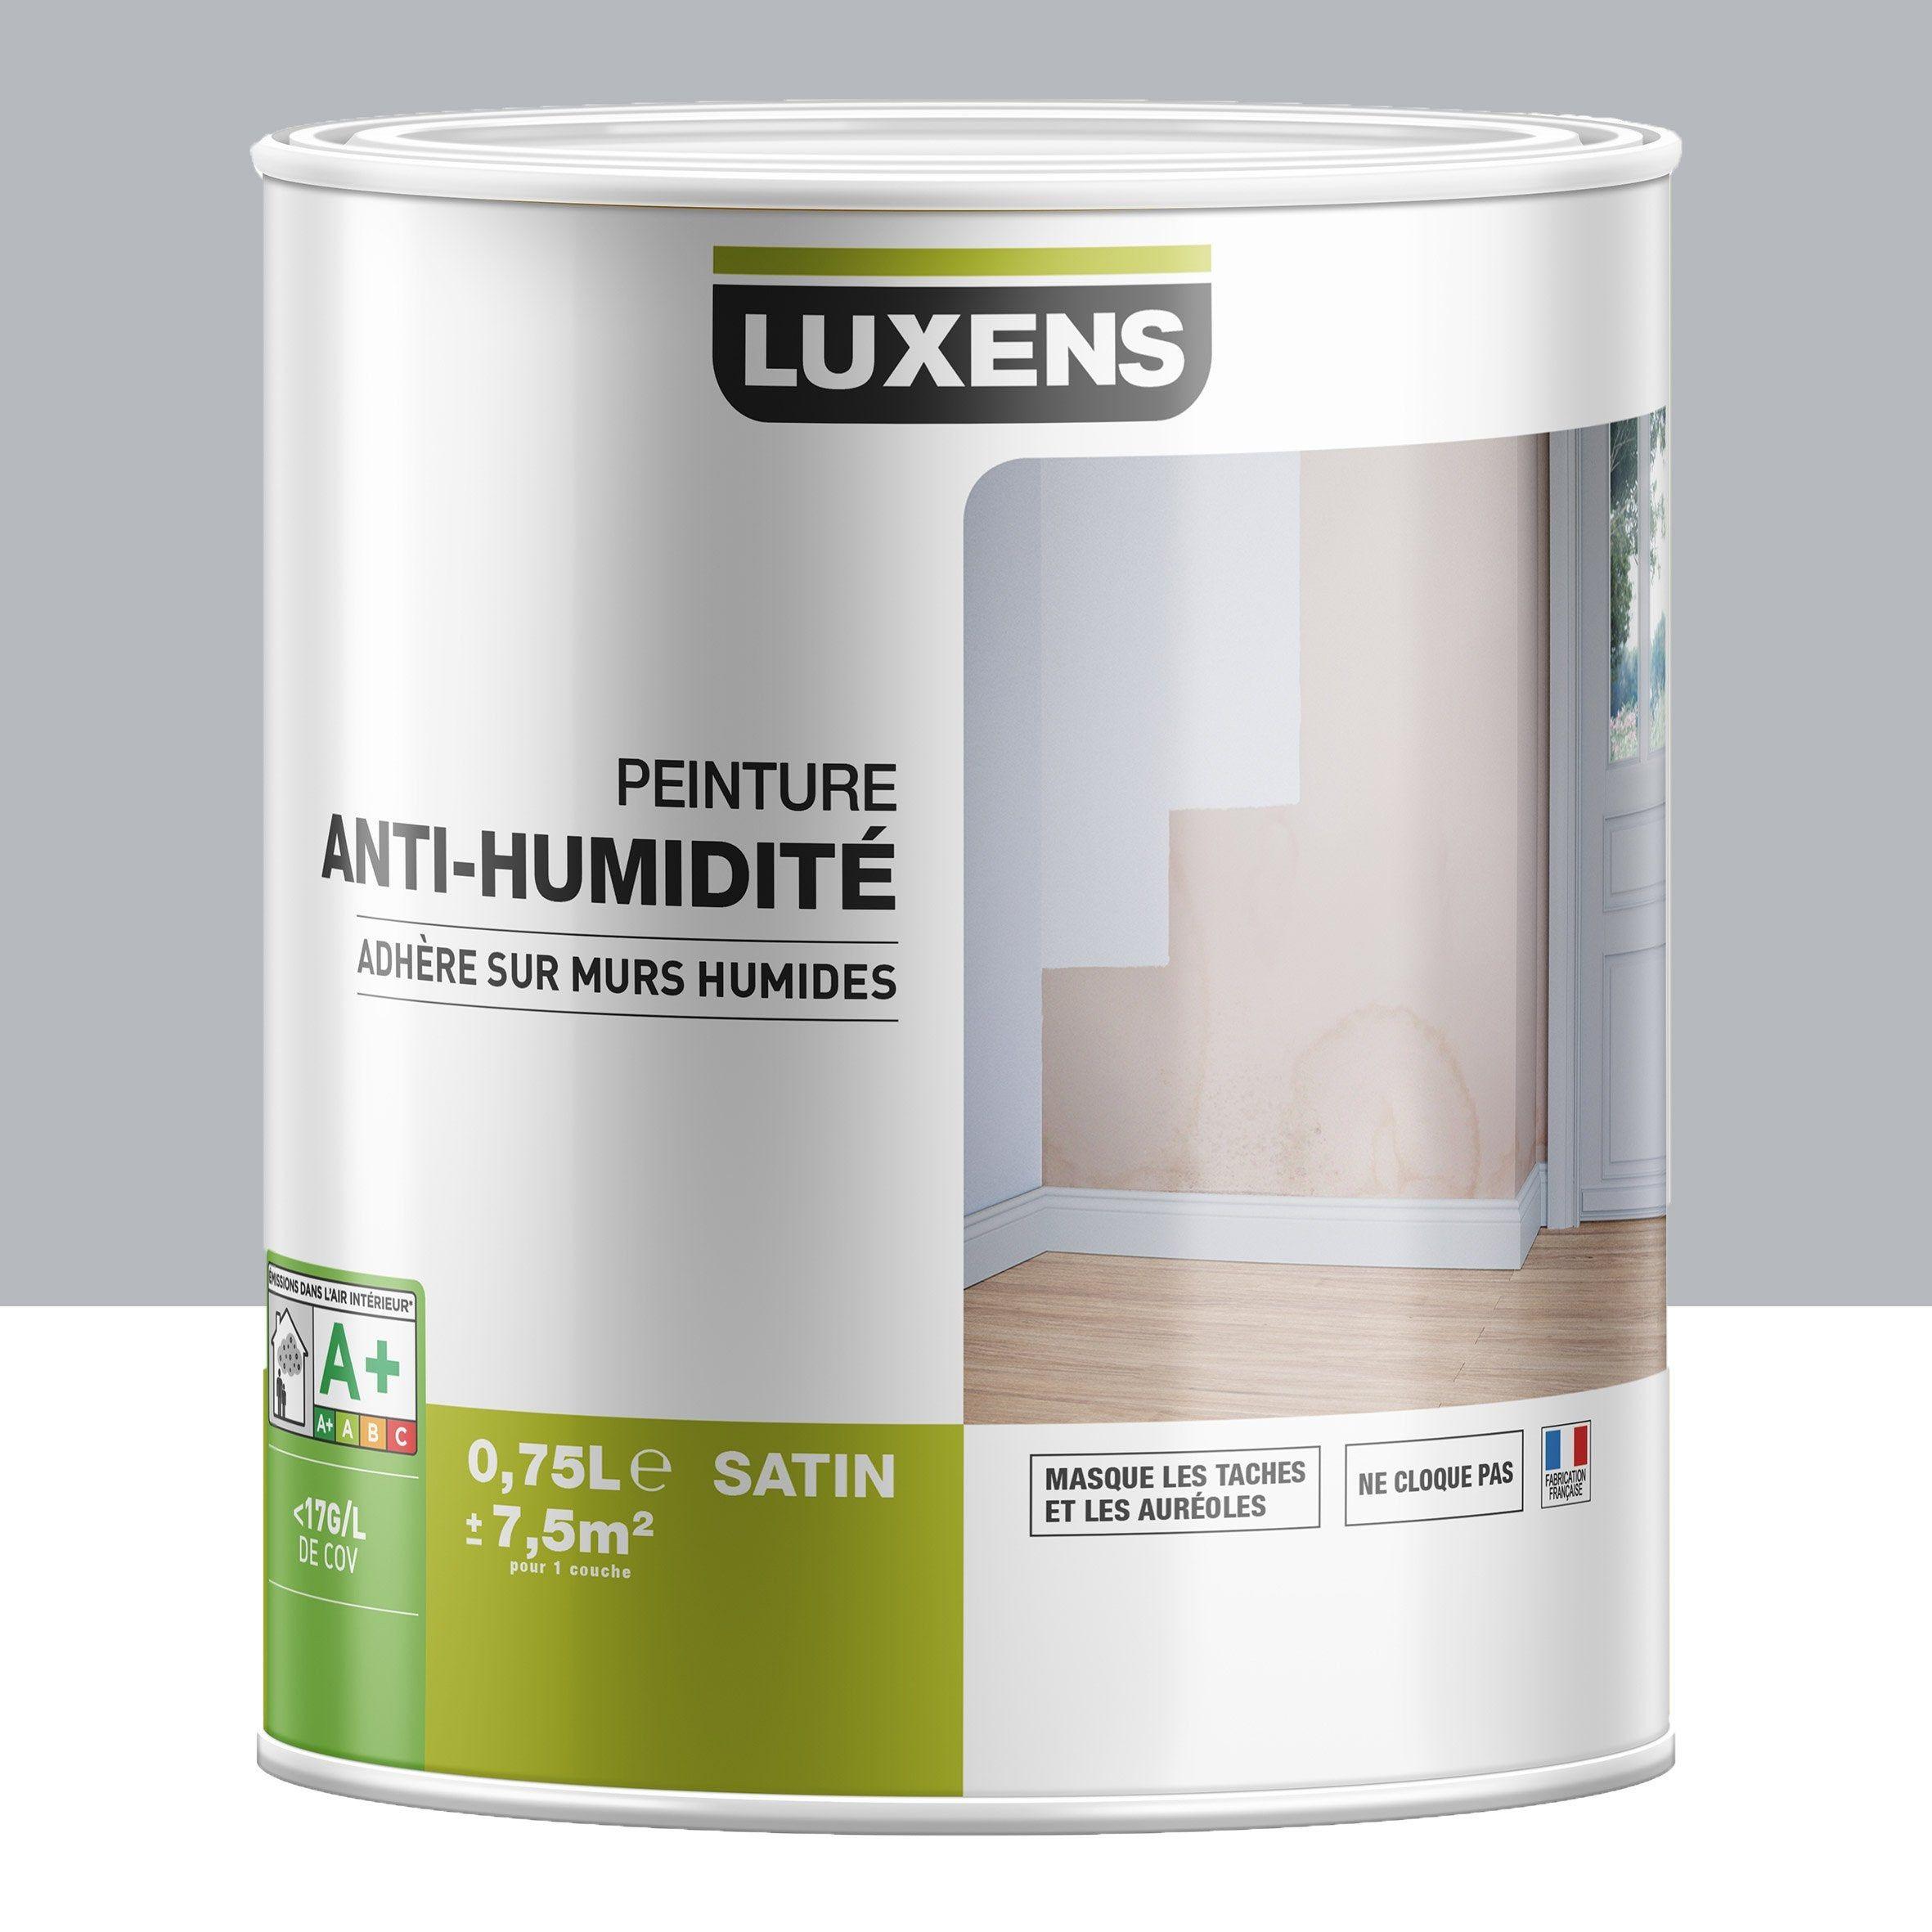 Peinture Antihumidite Luxens Gris 2 Peinture Gris Et Ivoire